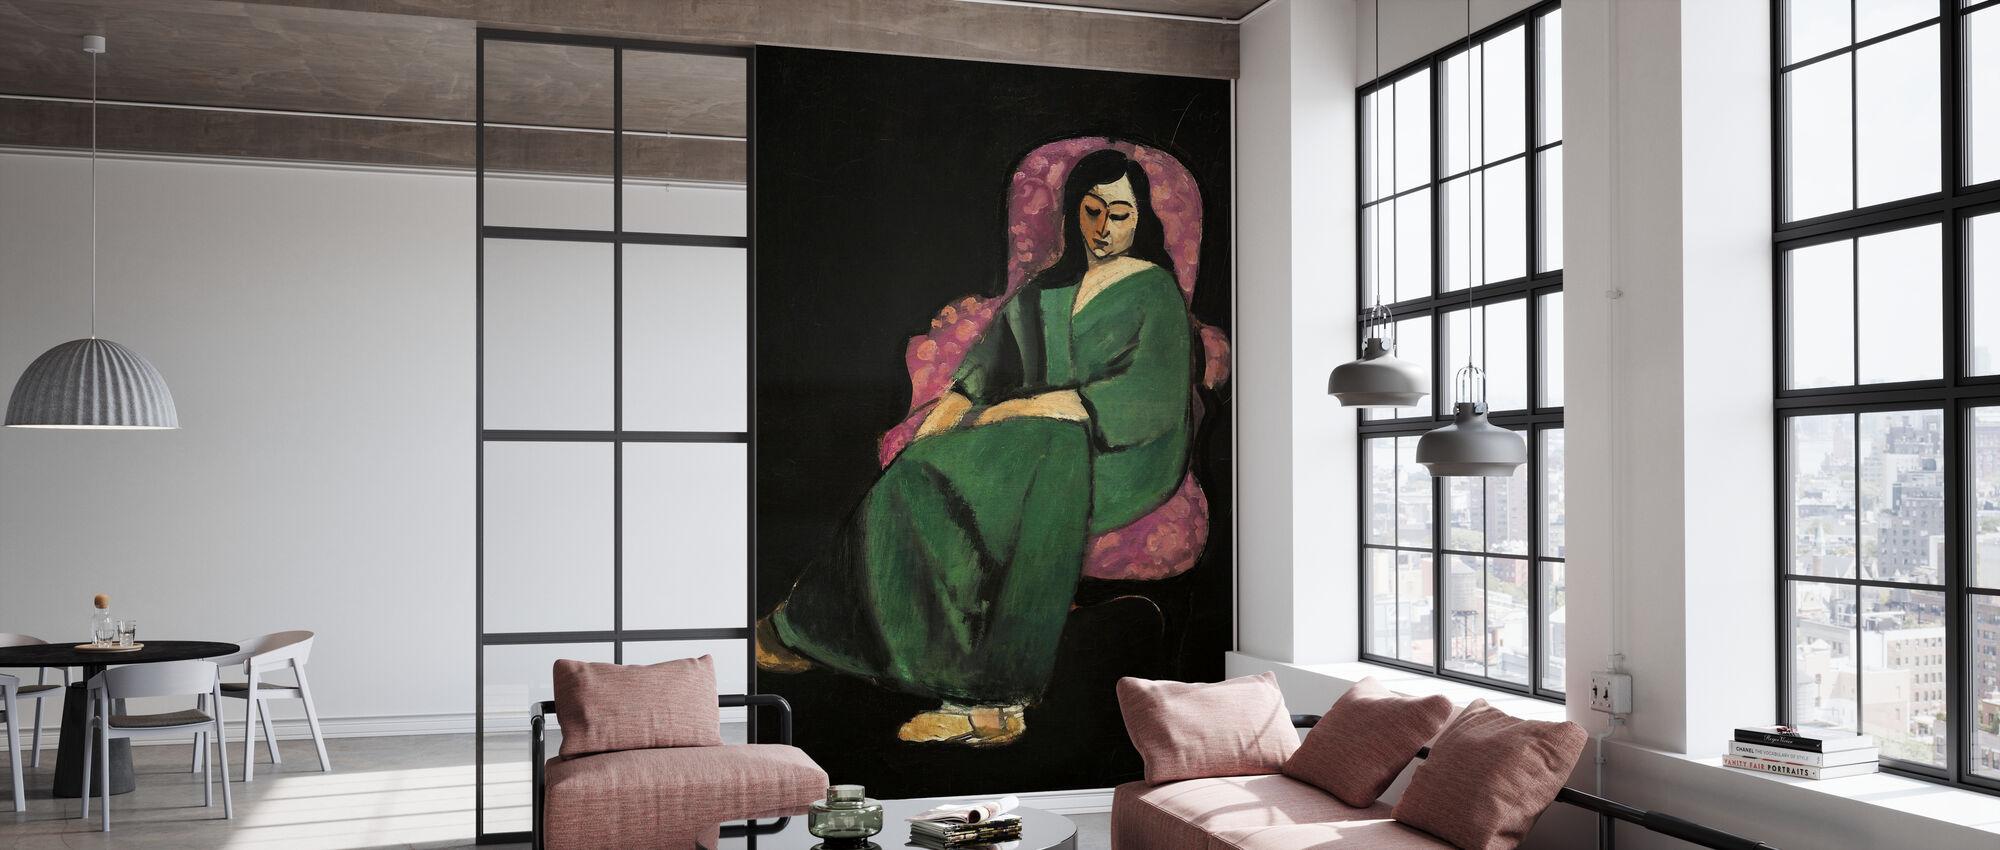 Handmaids Tale - Henri Matisse - Wallpaper - Office